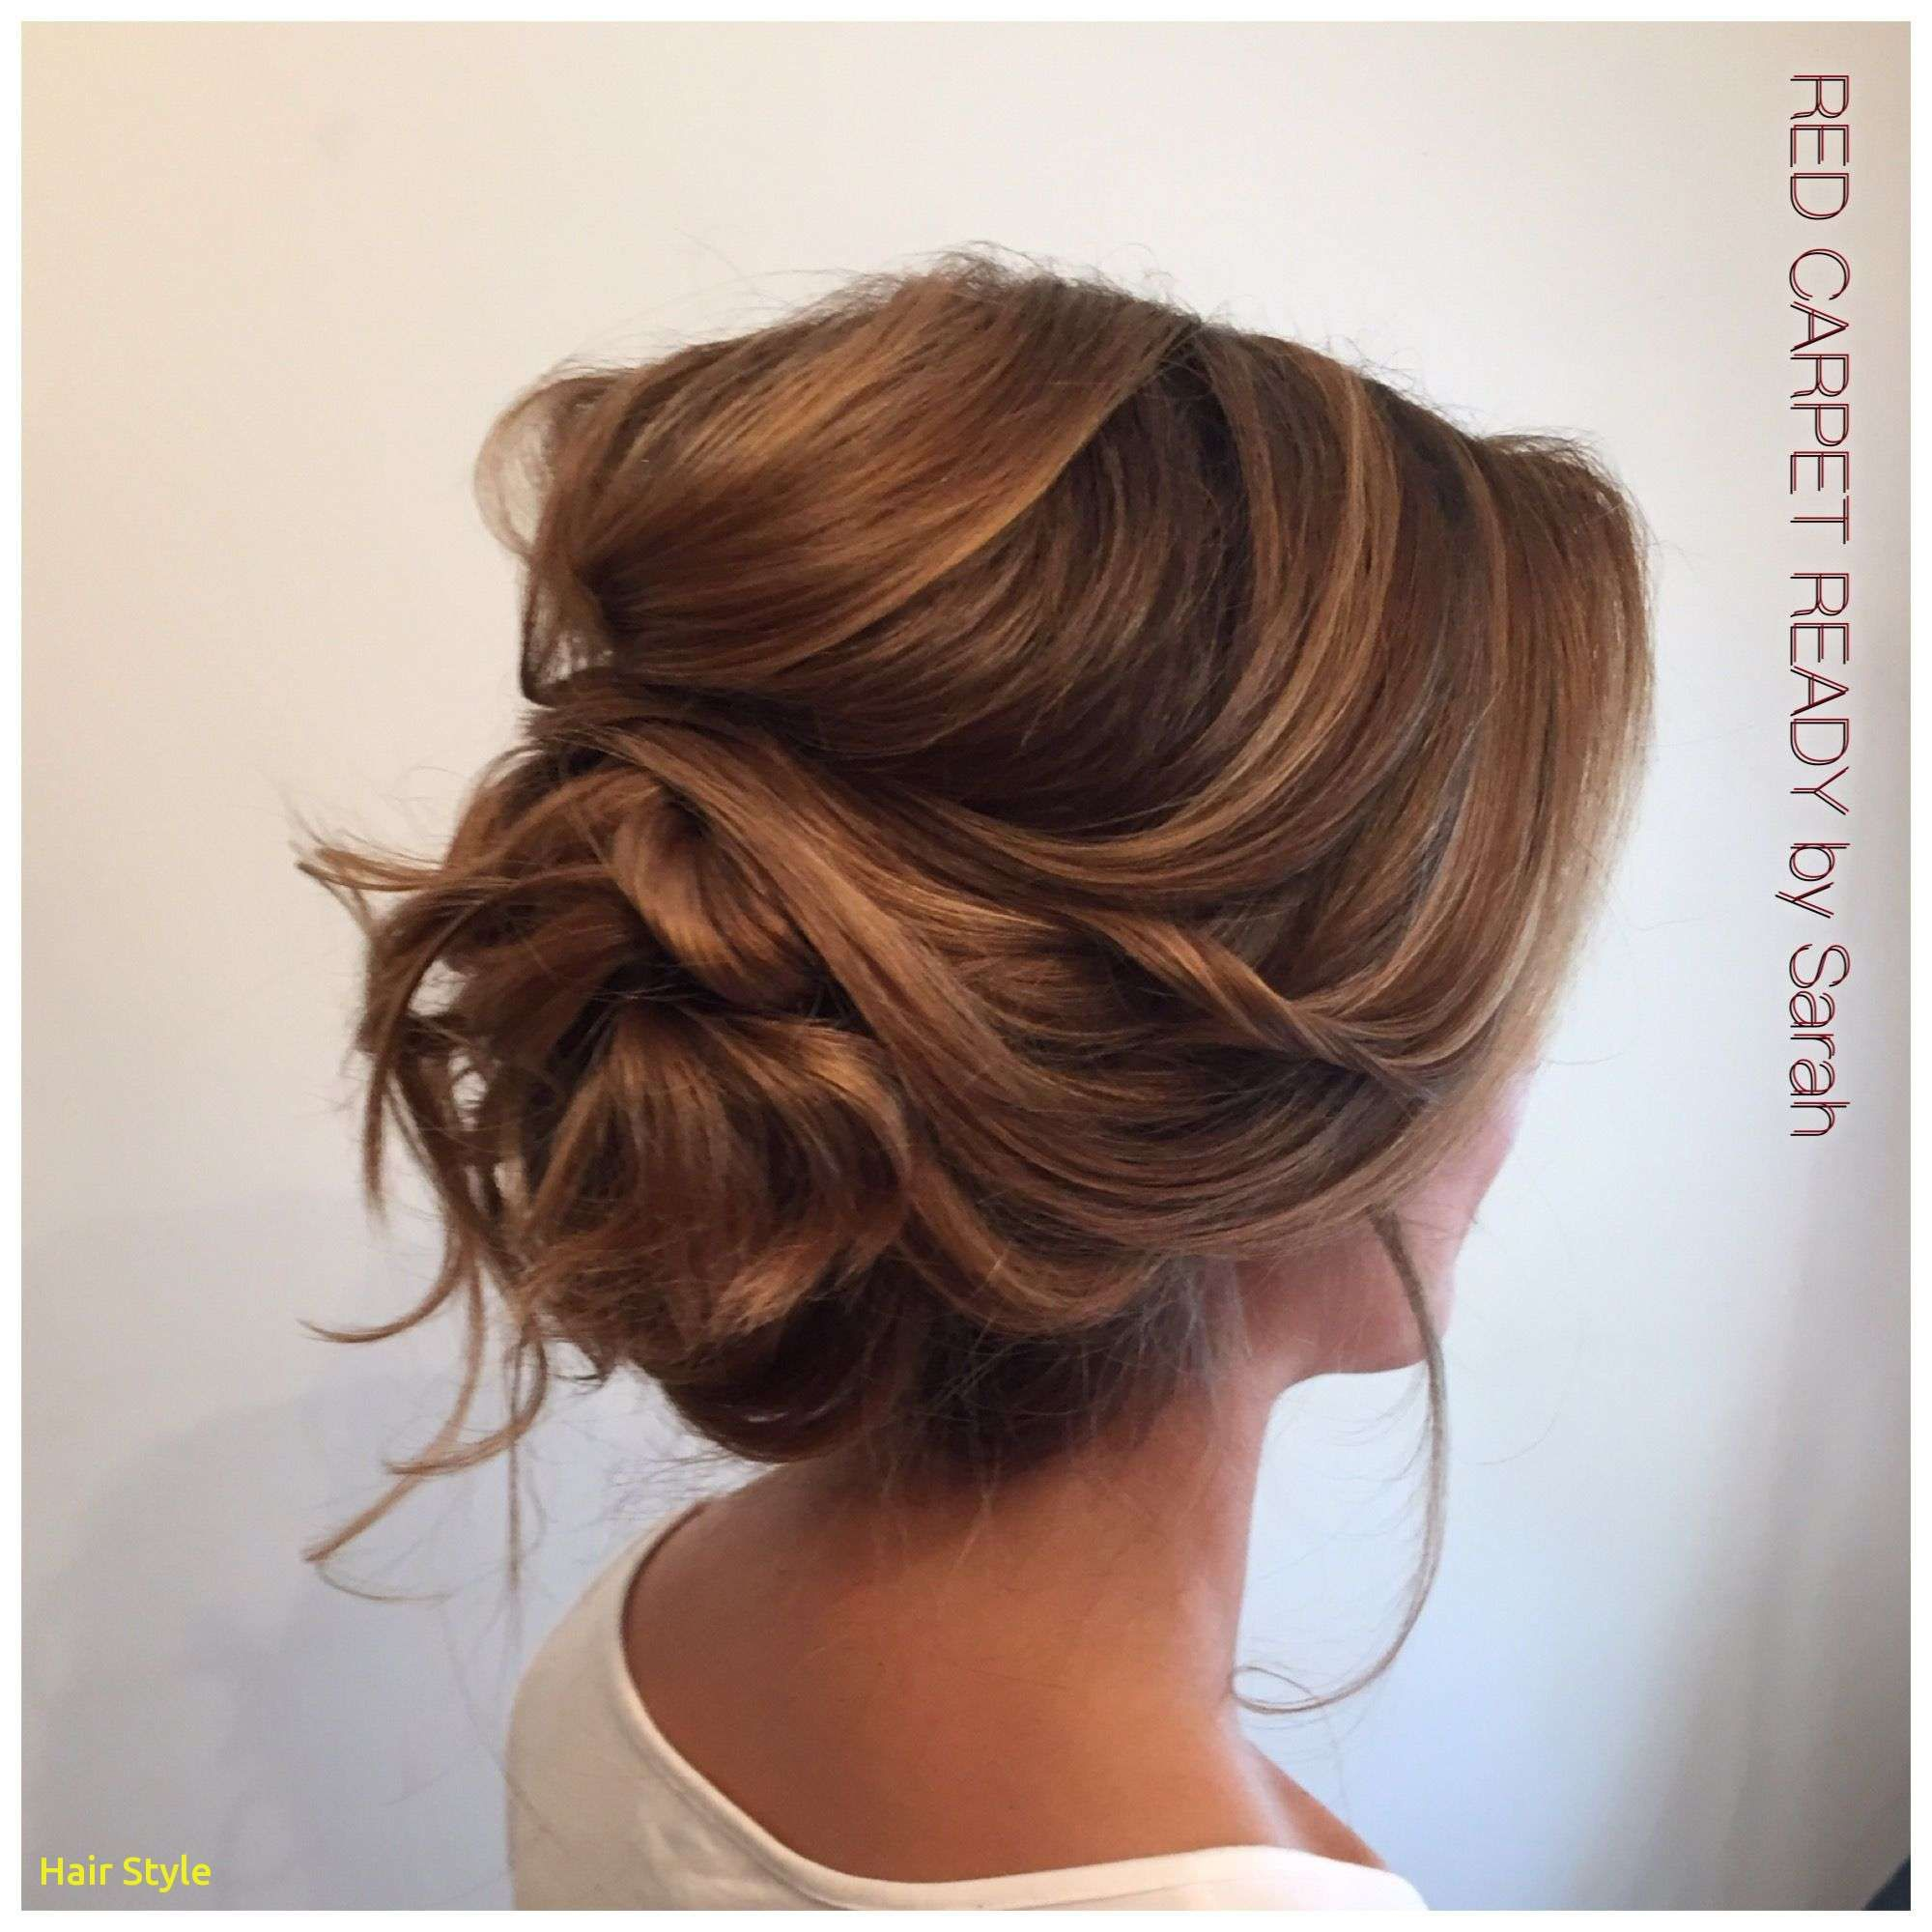 36+ Mariage coiffure ou maquillage en premier inspiration